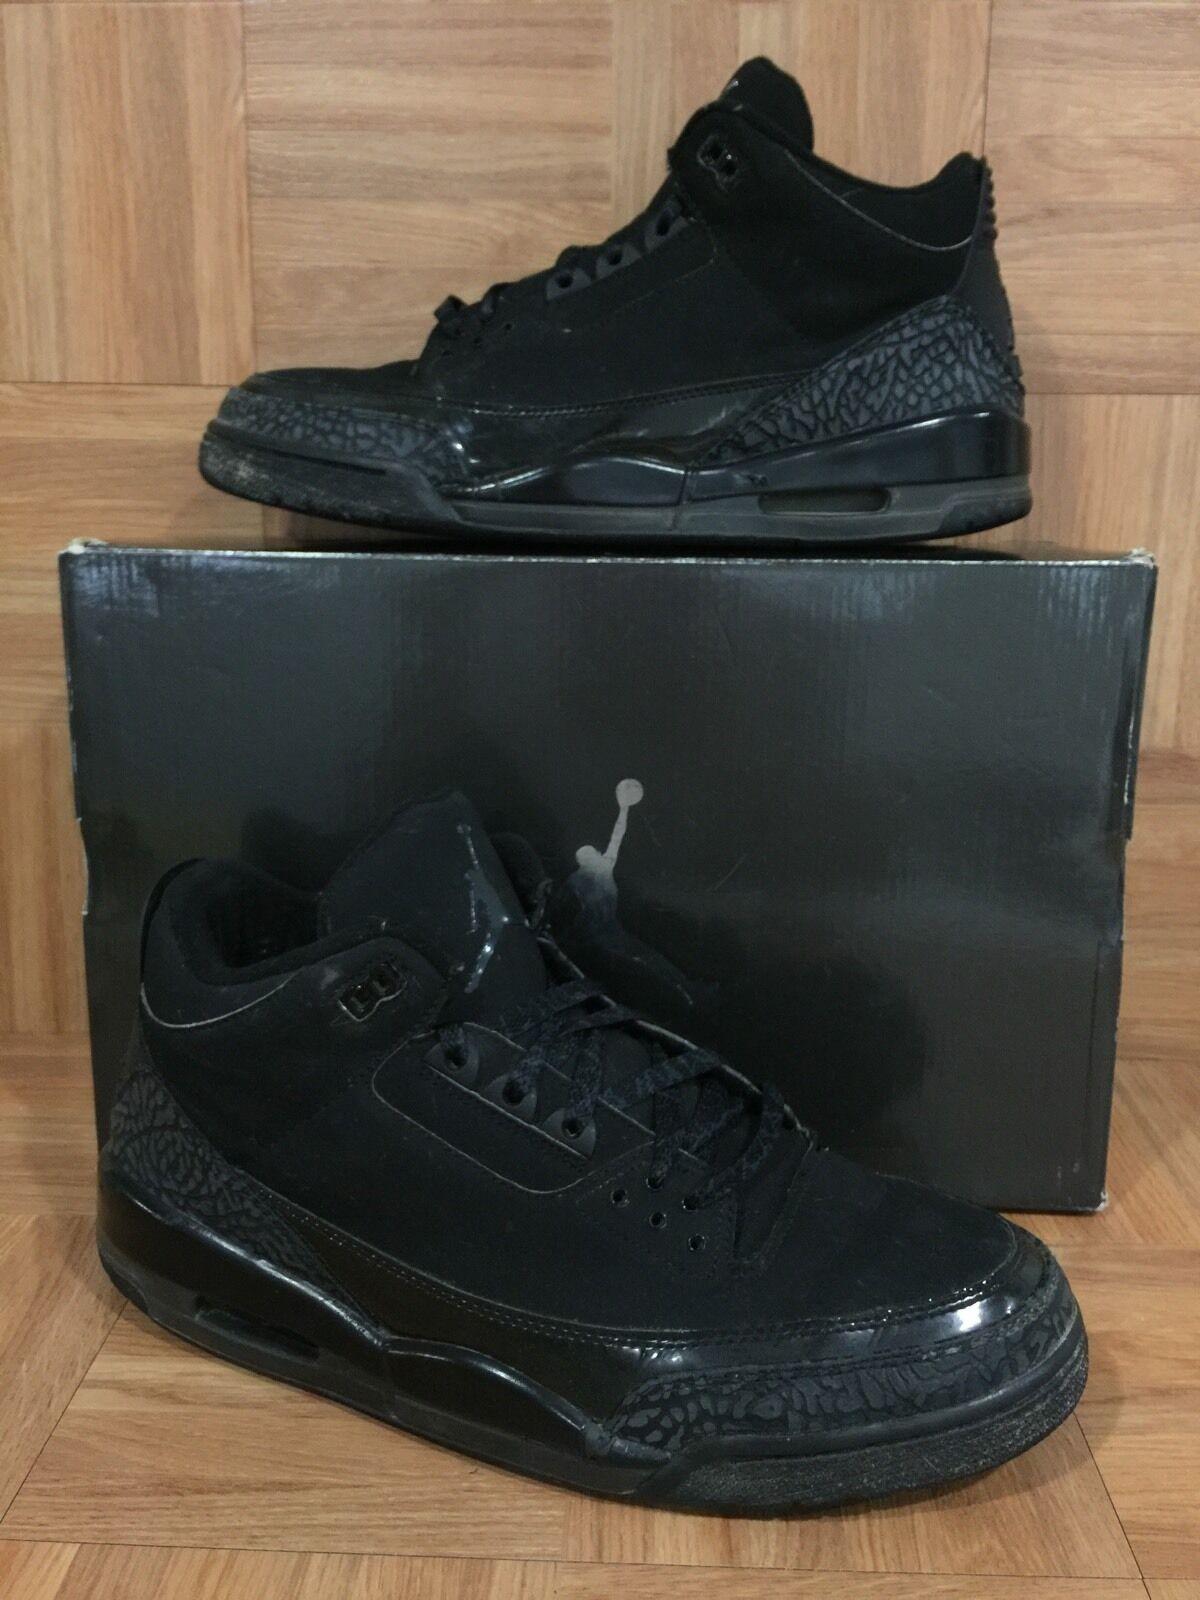 Selten � nike air jordan 3 retro - schwarze katze dunkle holzkohle sz 13 136064-002 krank